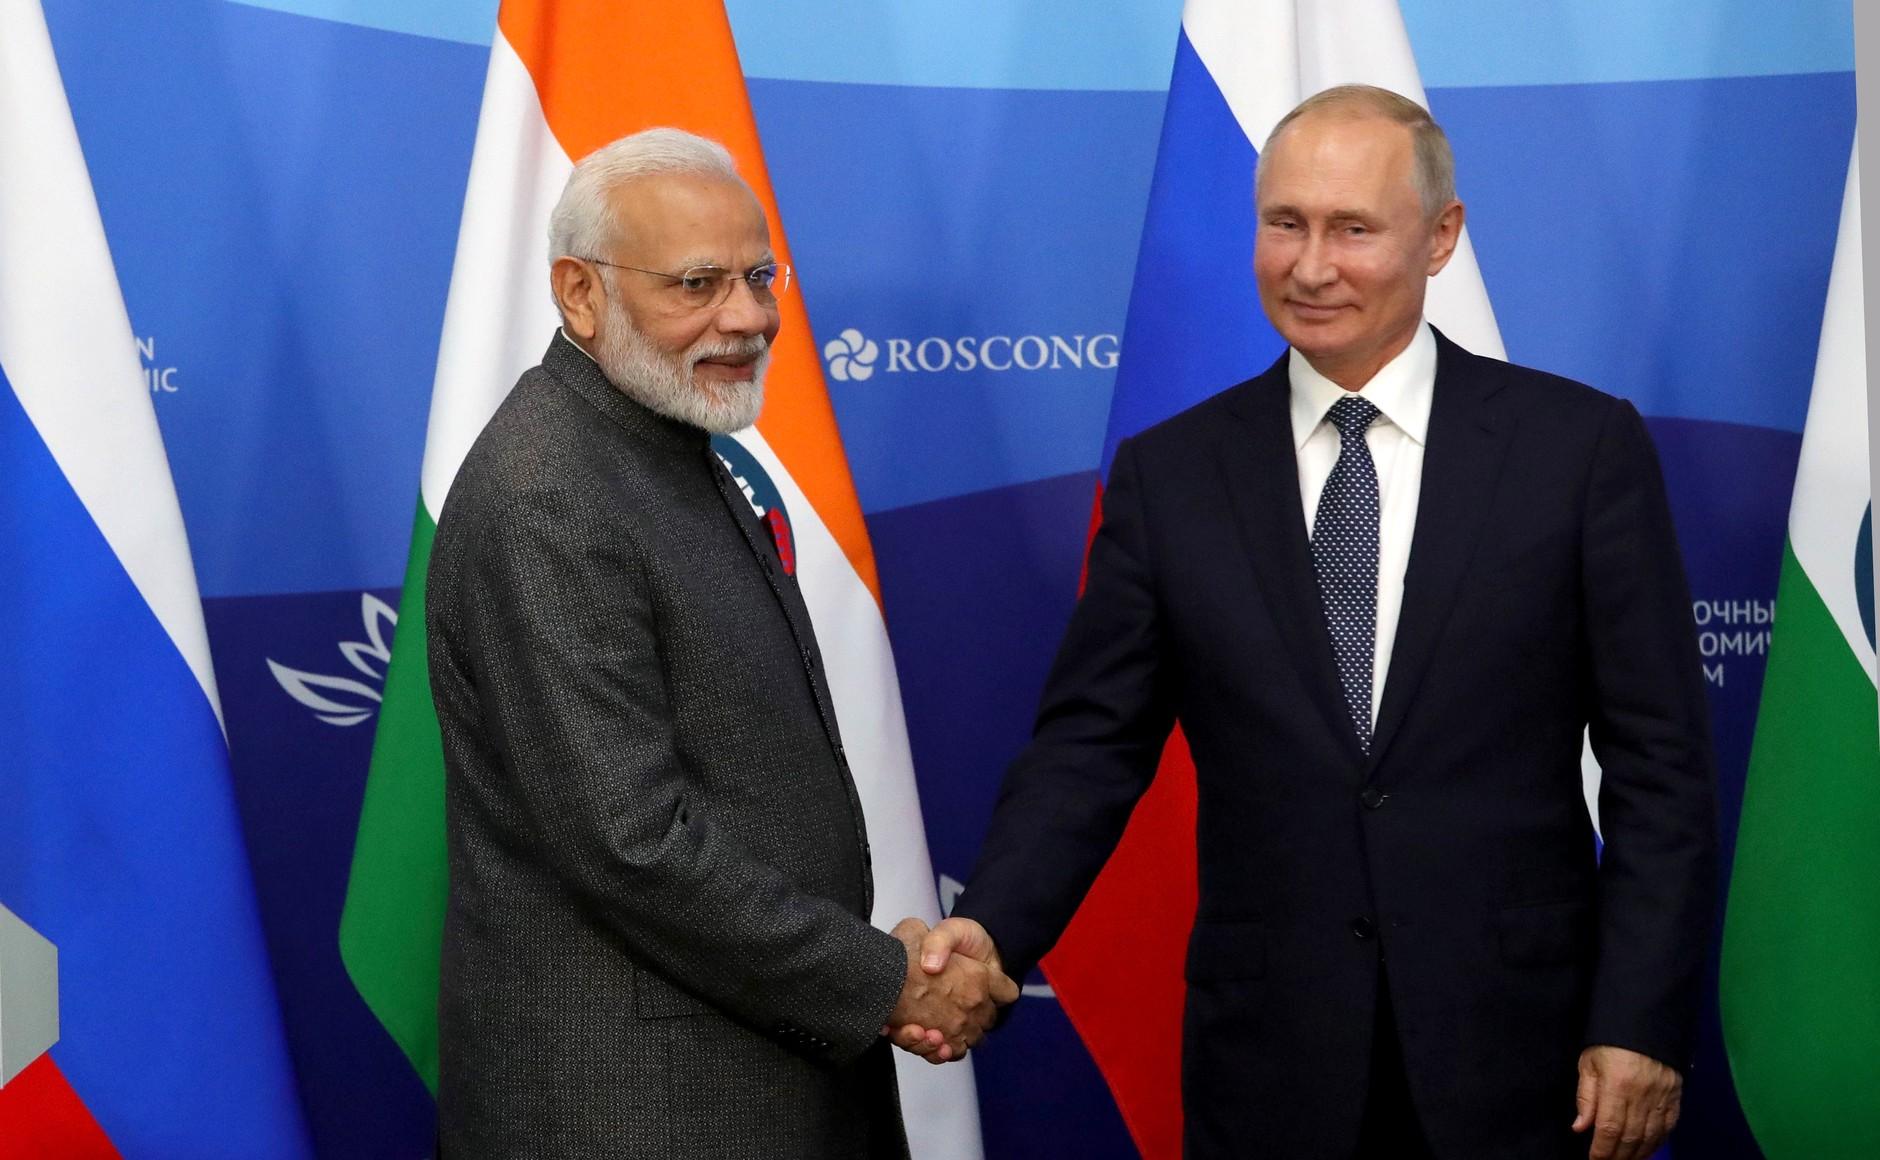 File:Indian Prime Minister Narendra Modi and Russian President Vladimir Putin make Press statements following talks (5).jpg - Wikimedia Commons